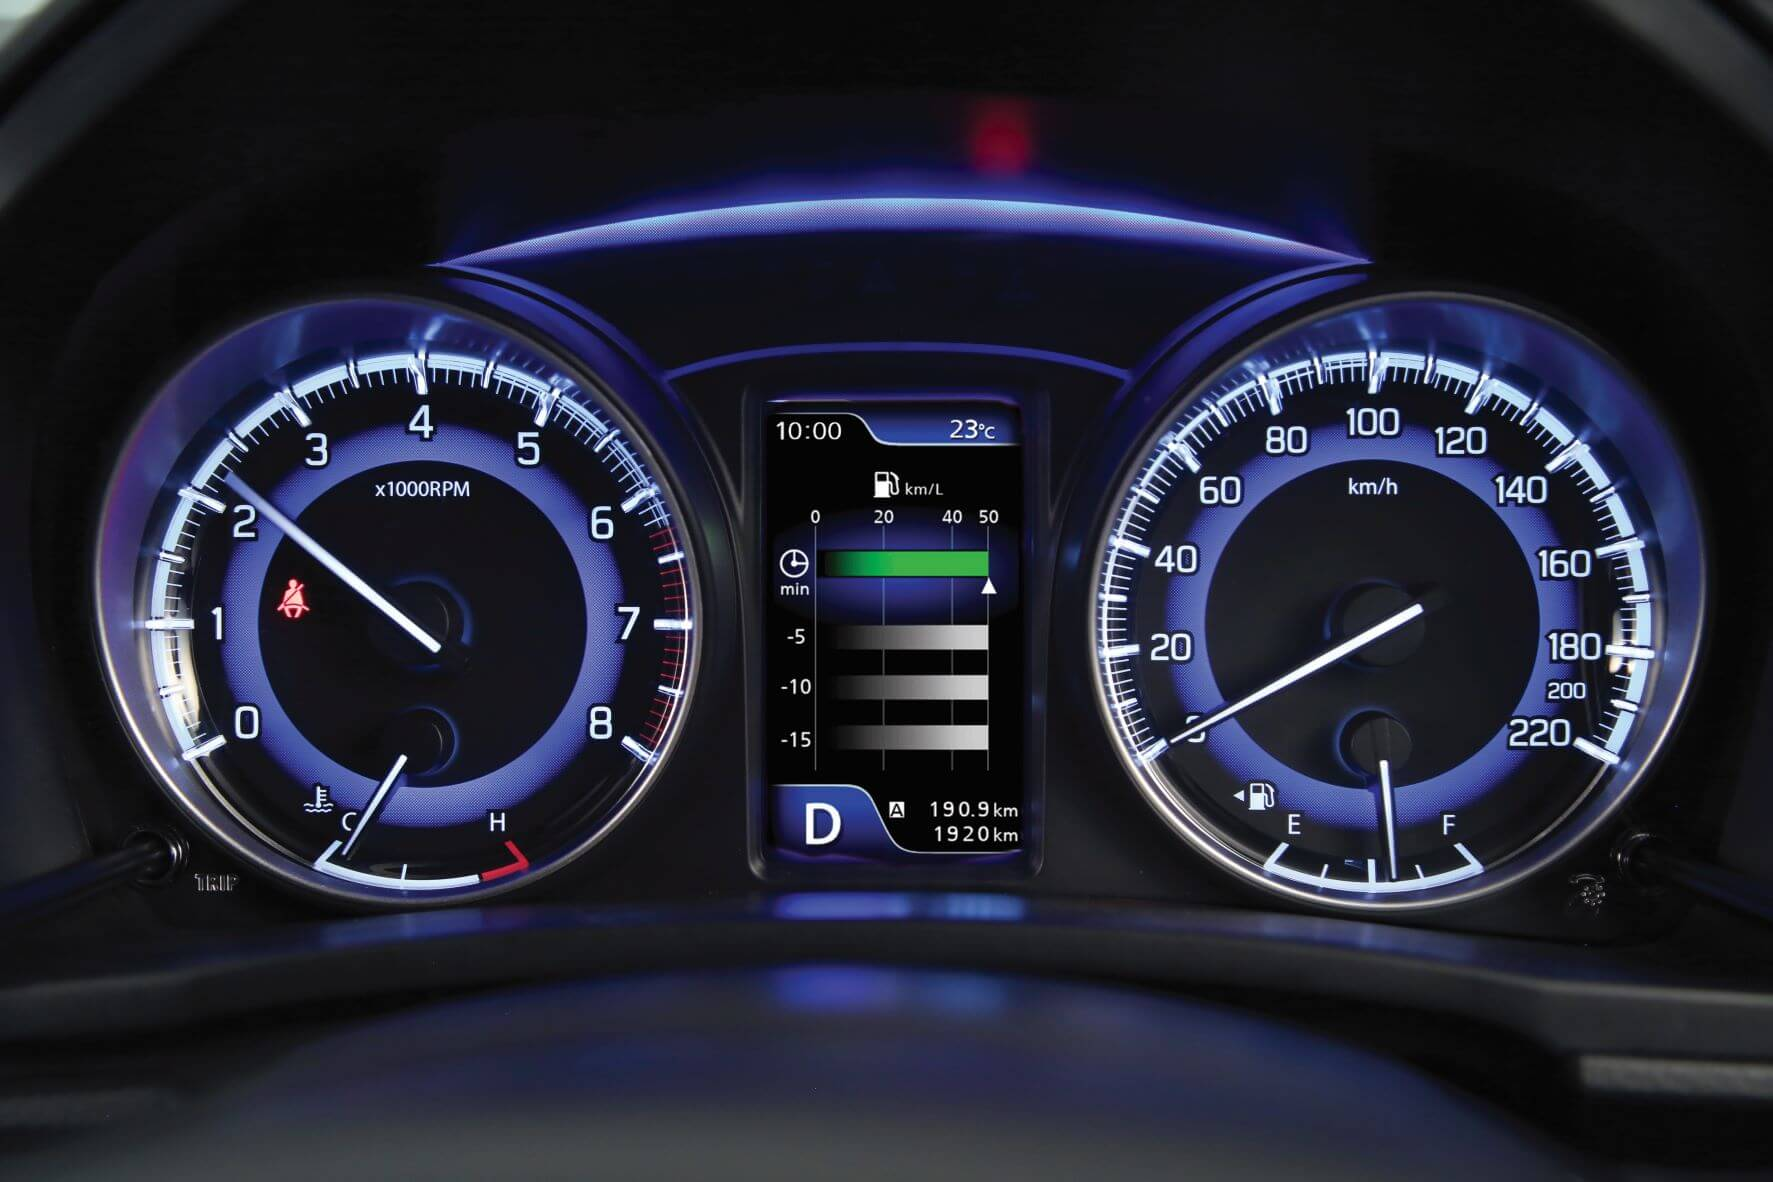 11559_6072_SASA_Baleno_Dashboard_Fuel_Efficiency_Photo.jpg